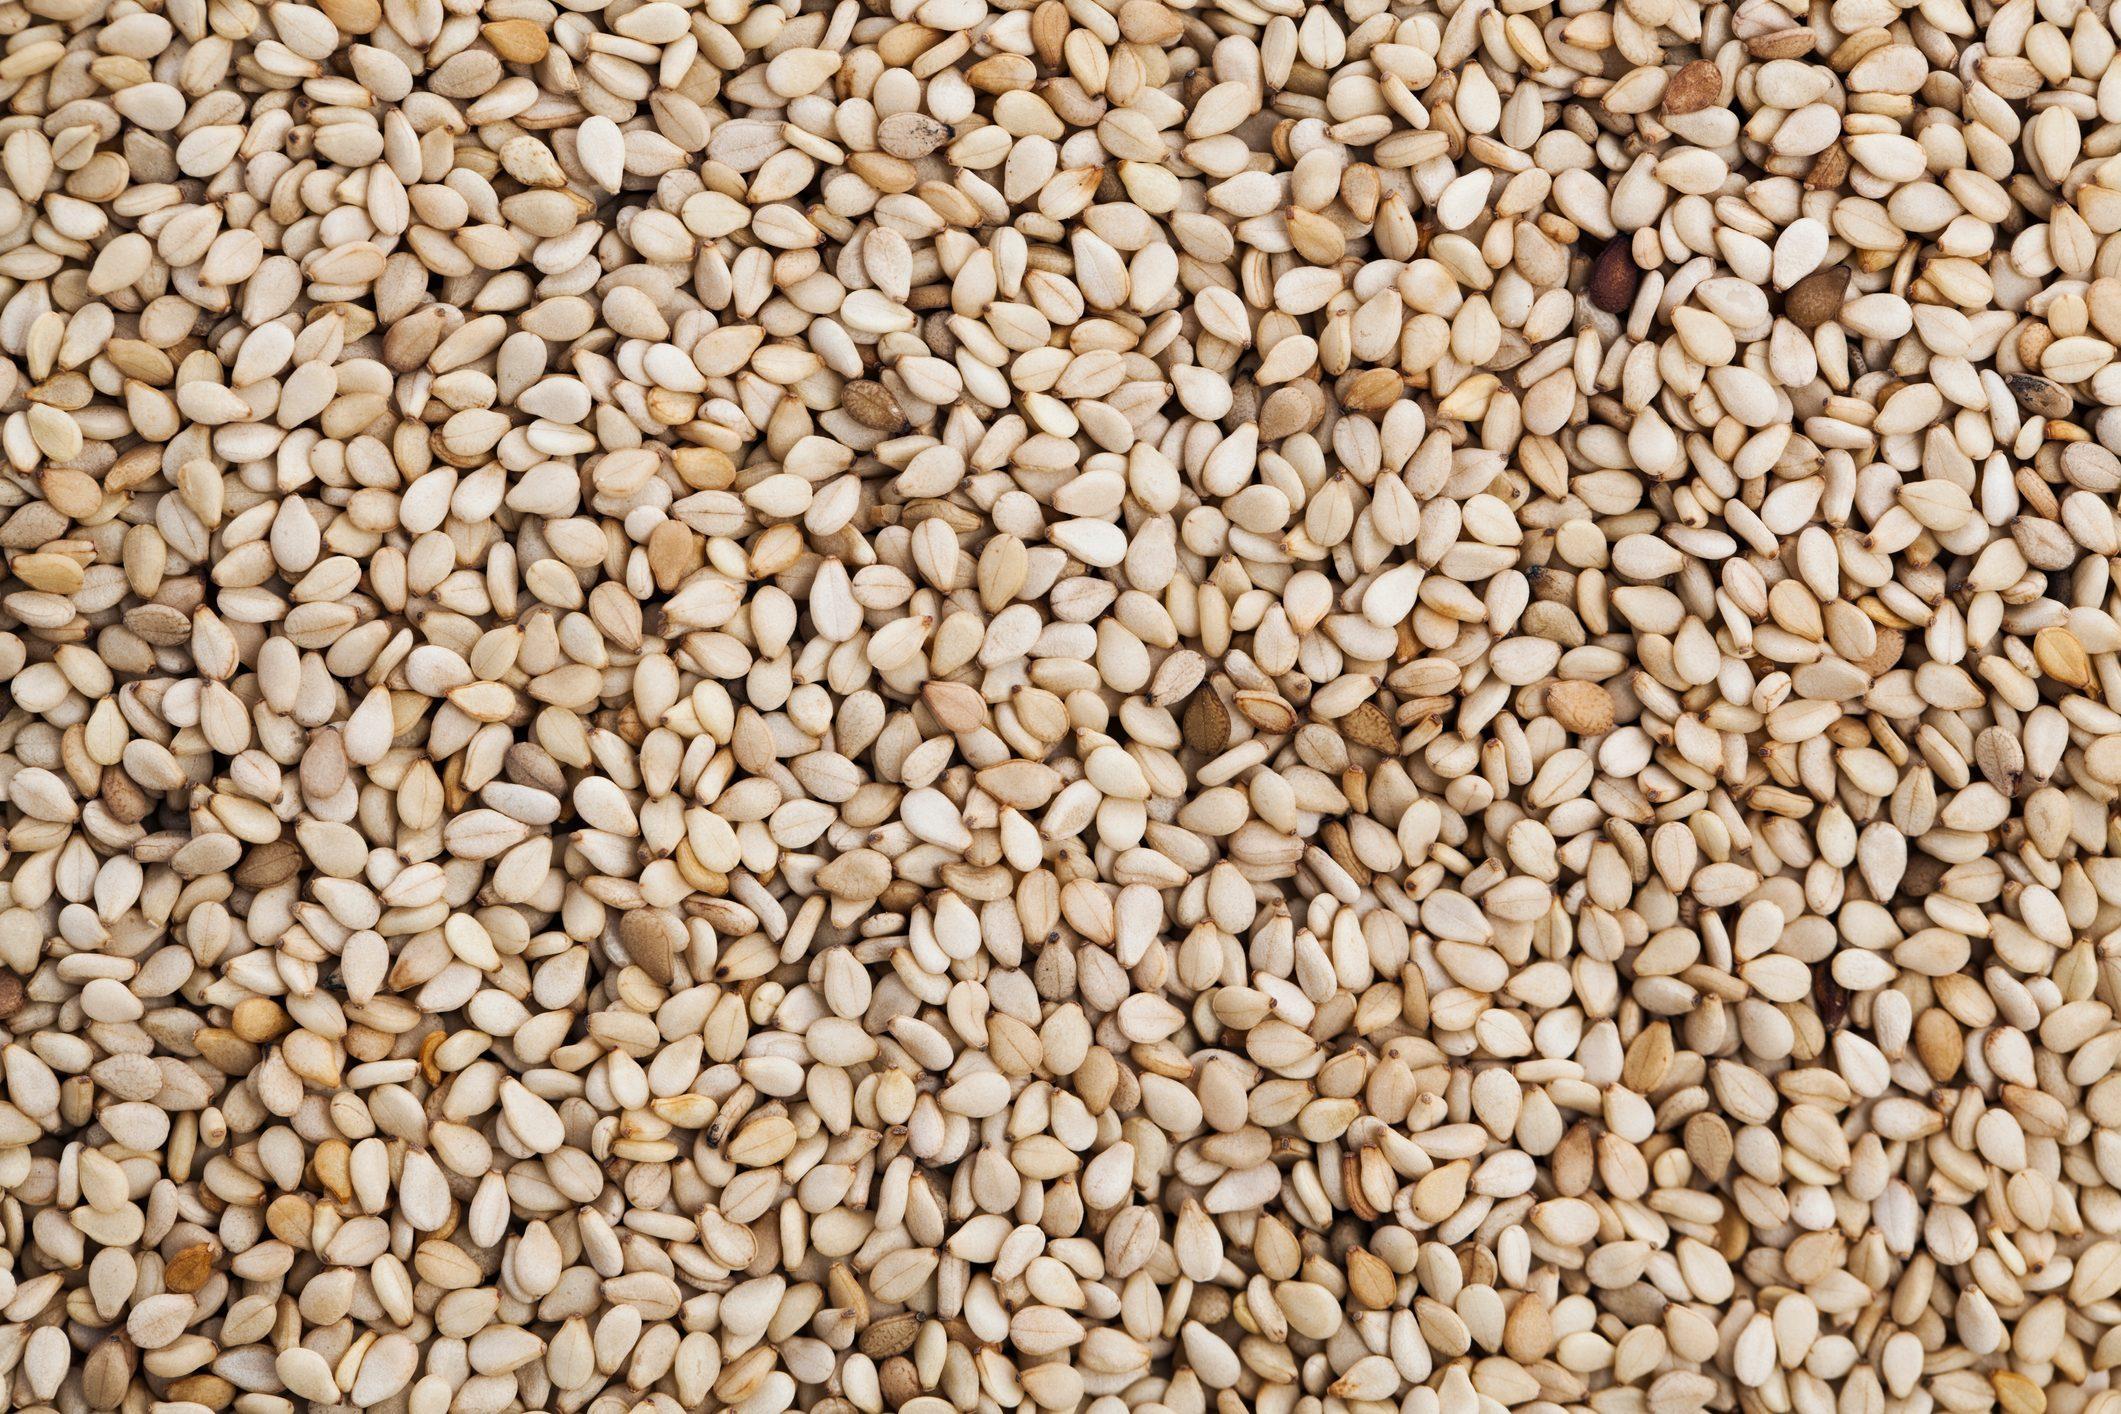 sesame seeds benefits | close up image of sesame seeds